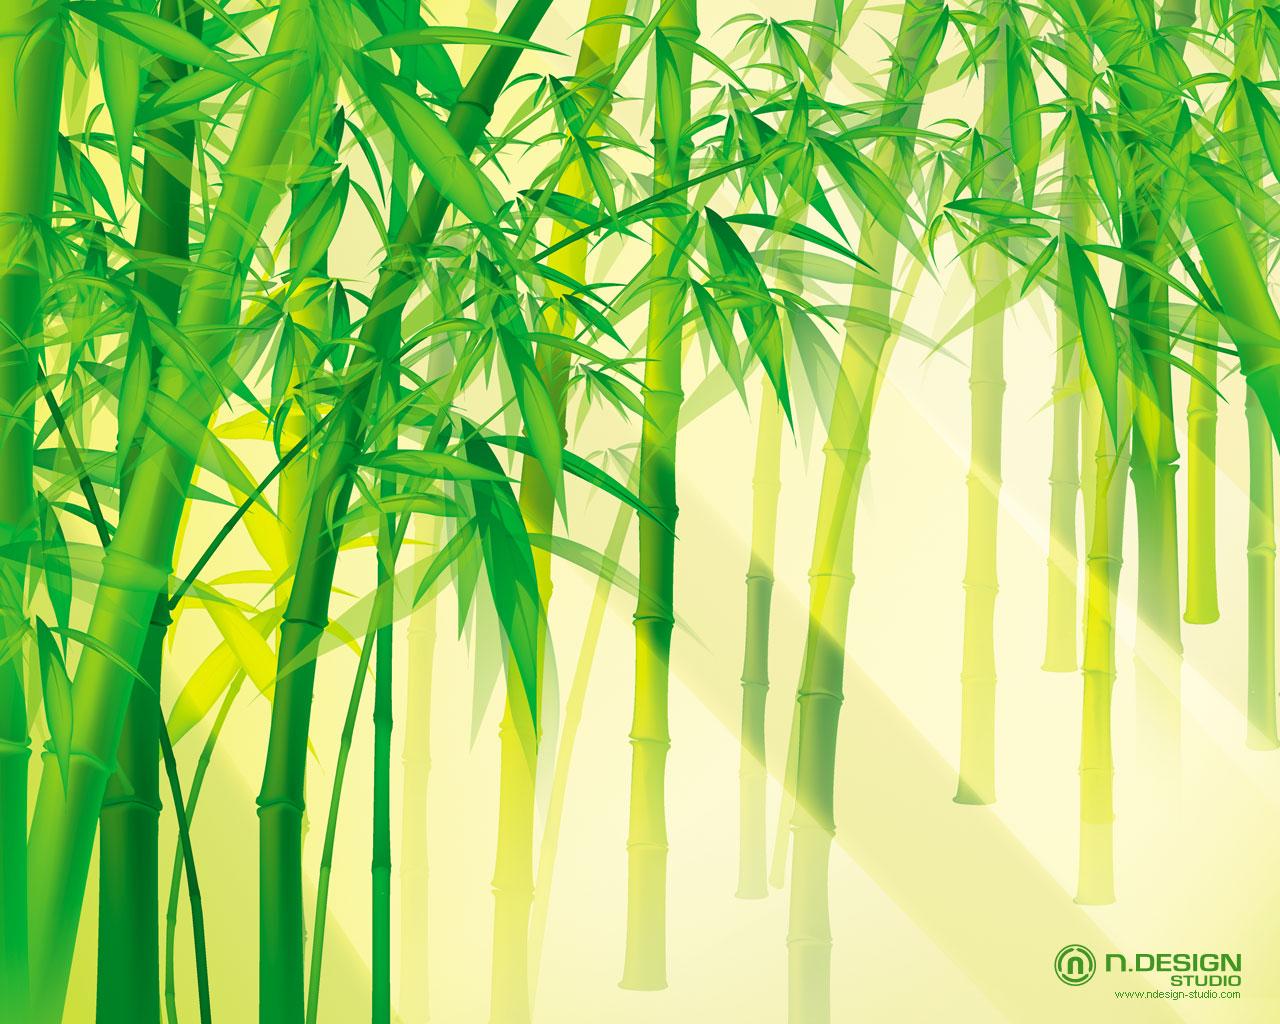 Bamboo scene - abstract wallpaper